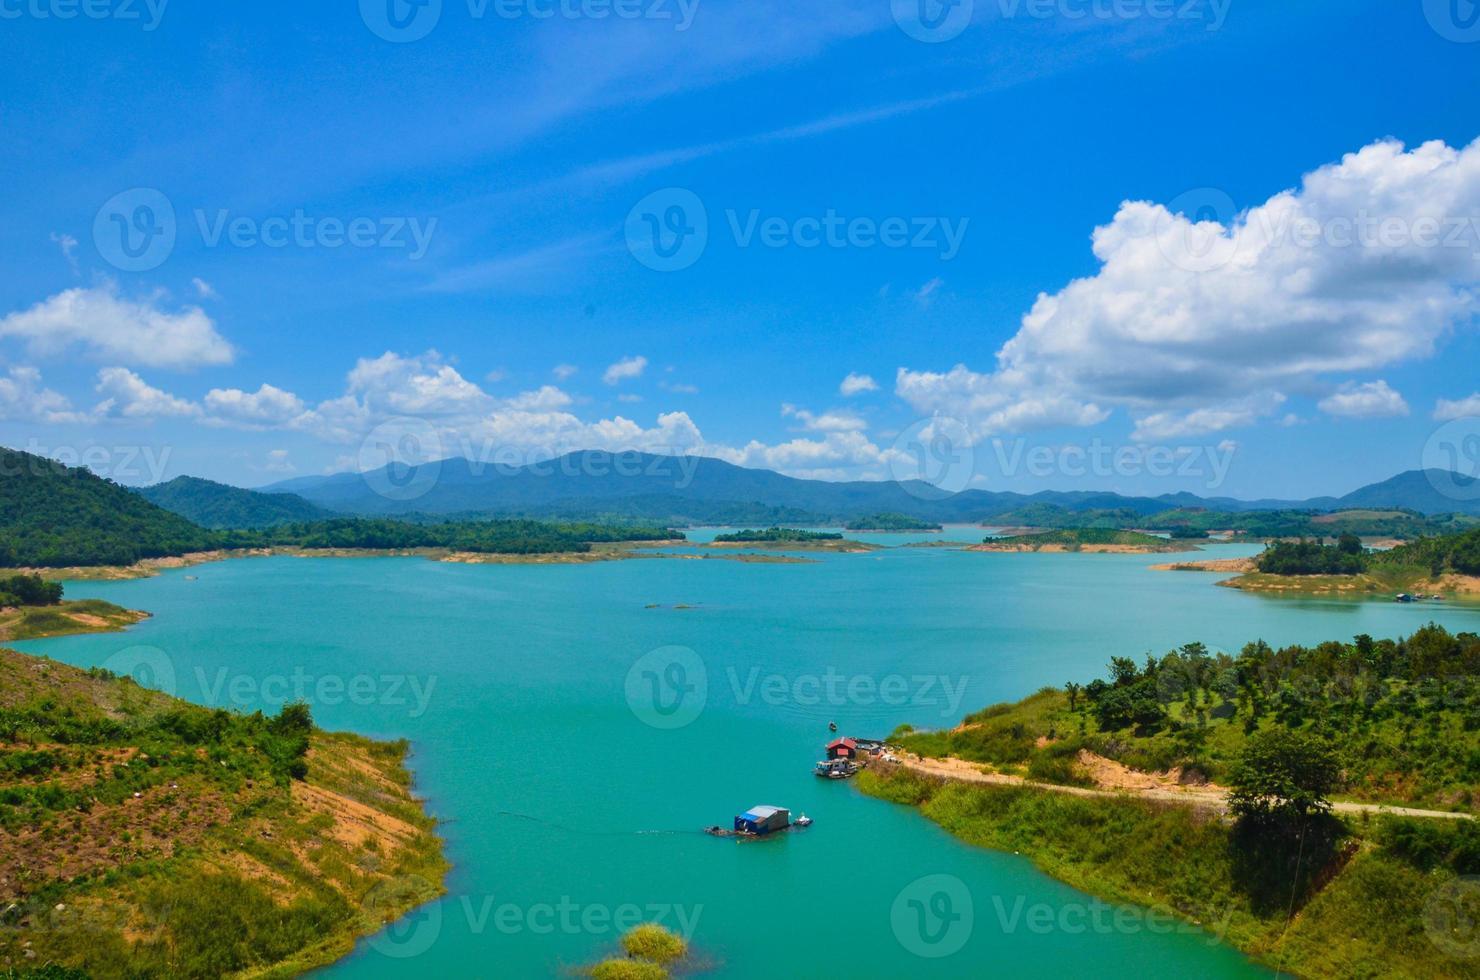 Lago Ham Thuan, una destinazione vicino alla città di Dalat foto